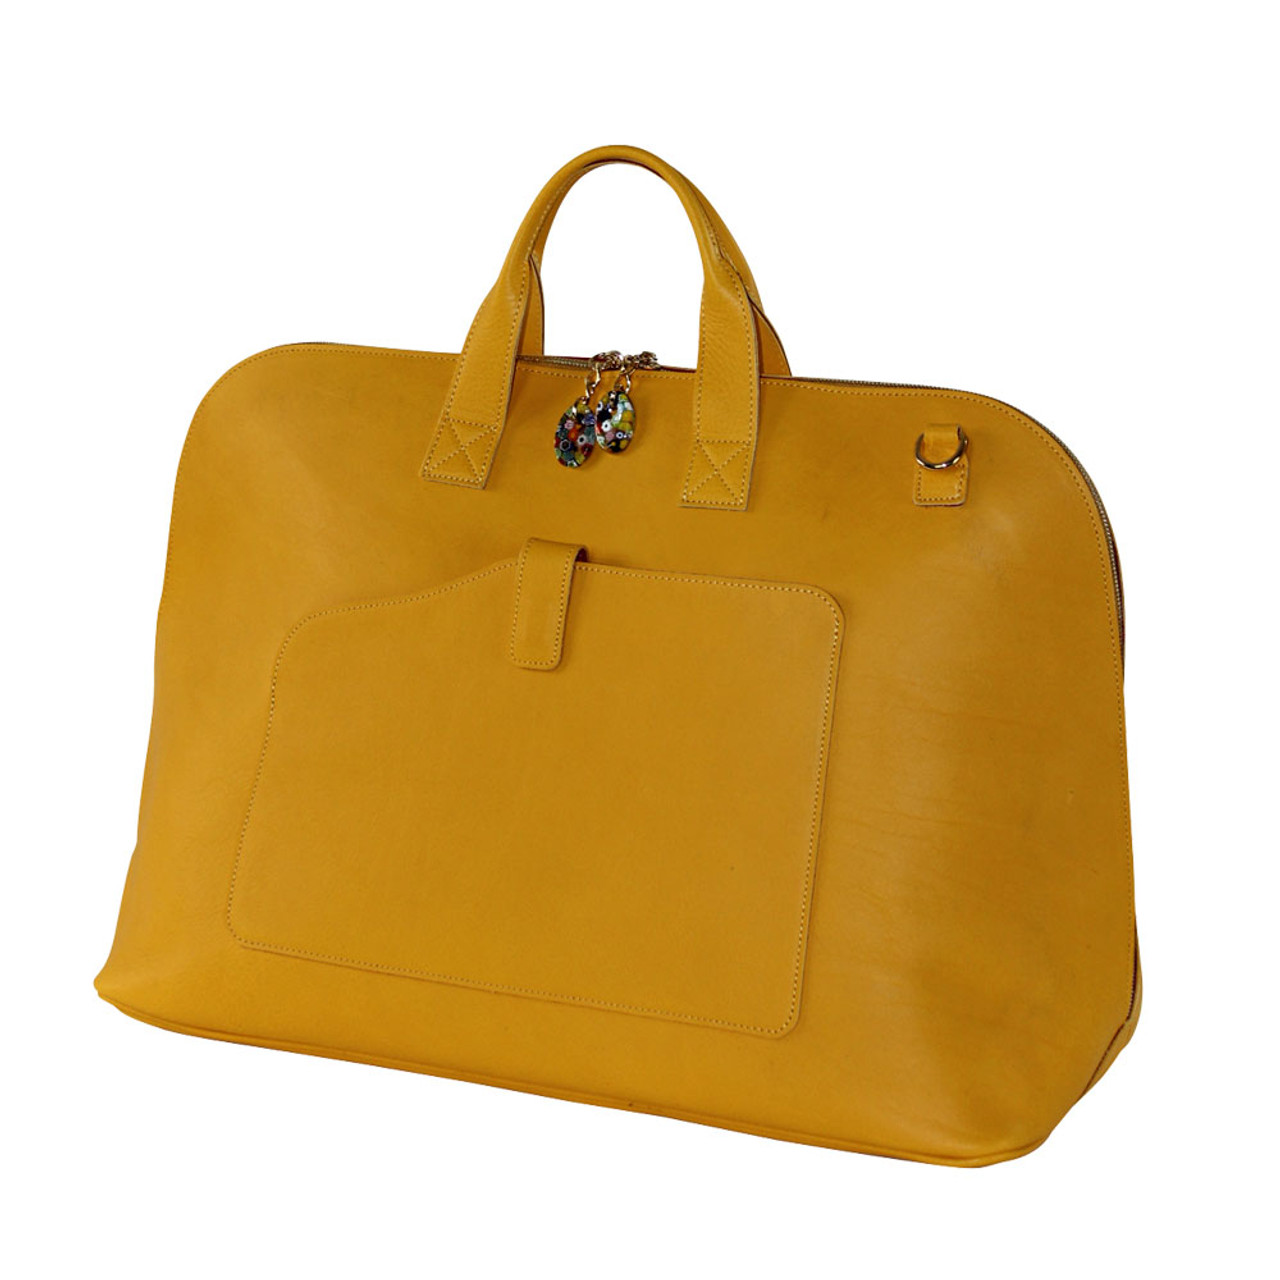 Terrida Veneto Italian Leather Large Travel Bag